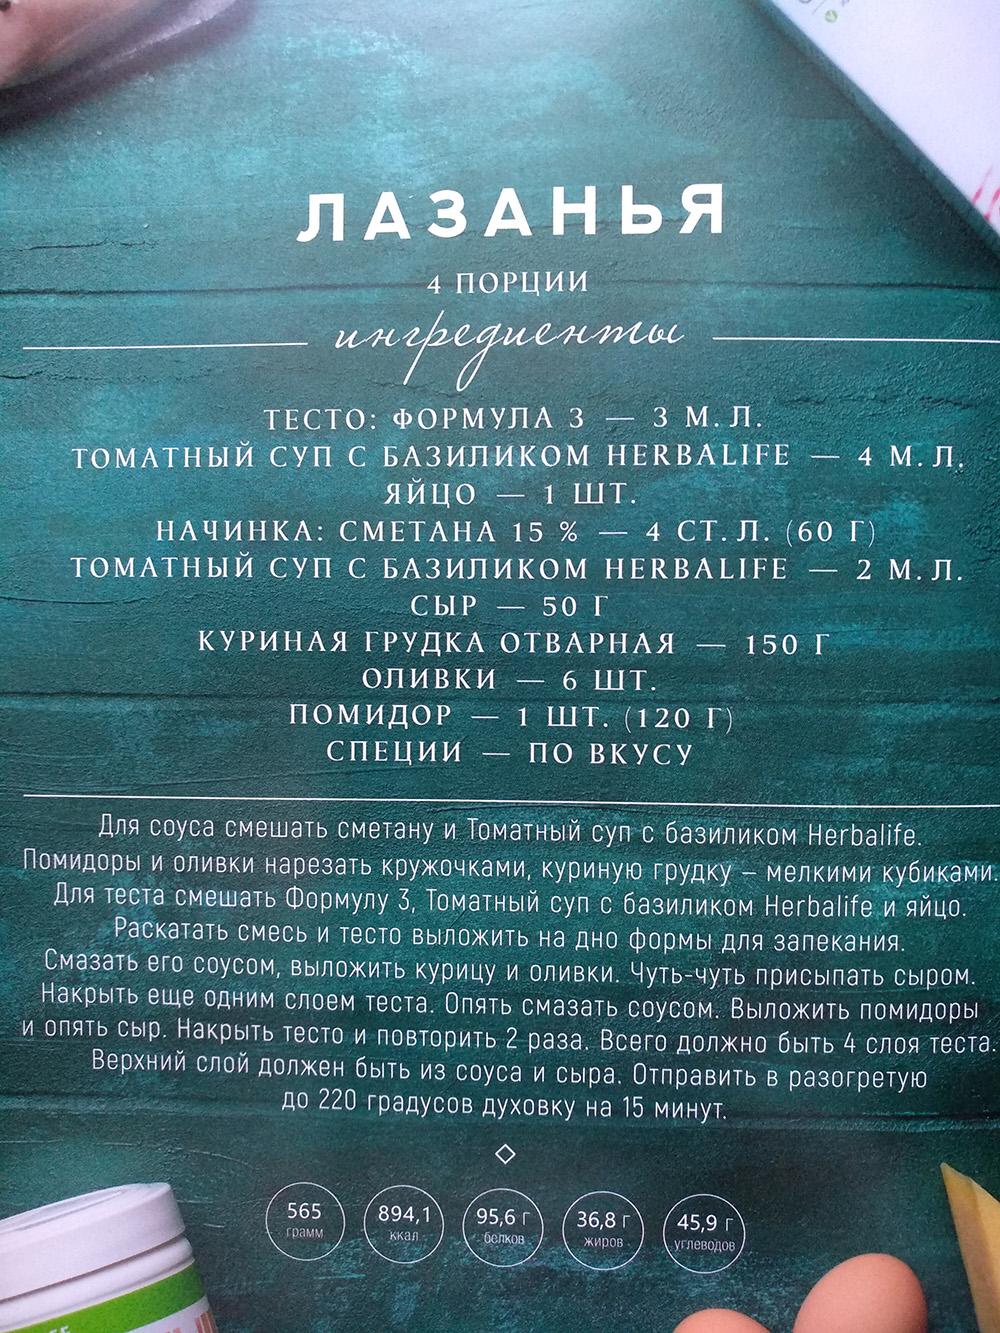 лазанья гербалайф